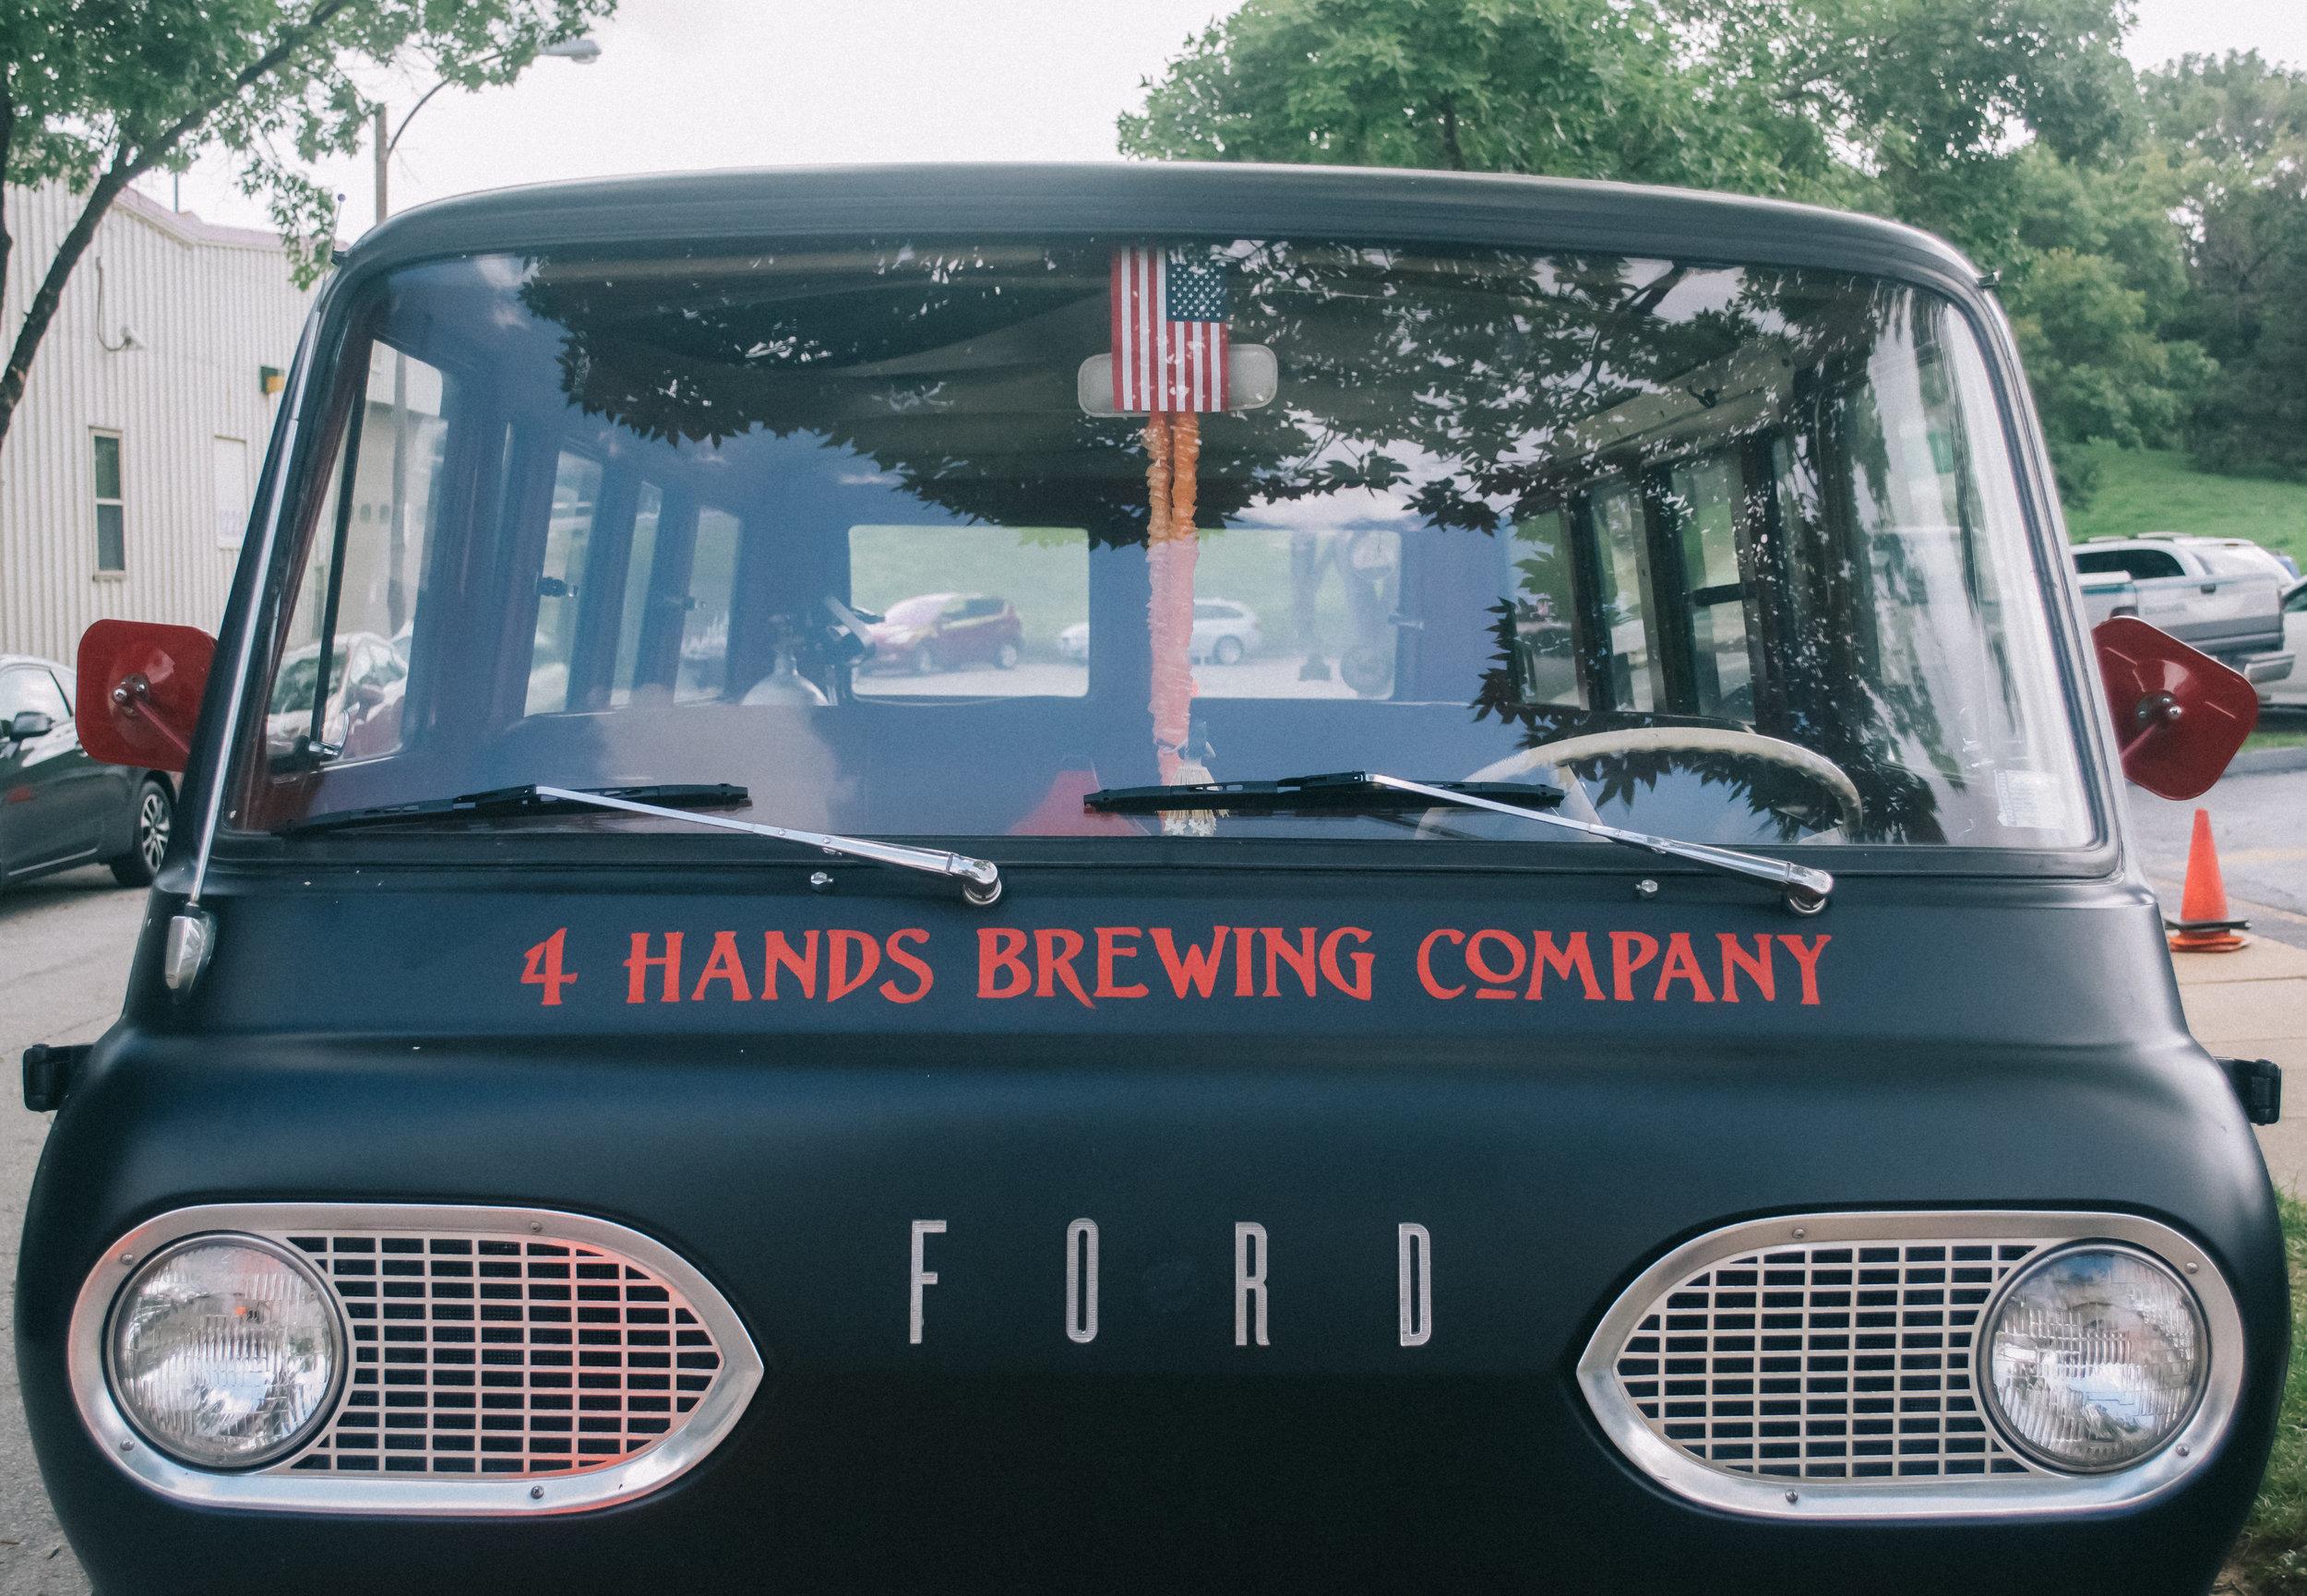 4-Hands-Brewing-St-Louis-Missouri-Beer-Matt-Sampson-Photography-Van-2.jpg